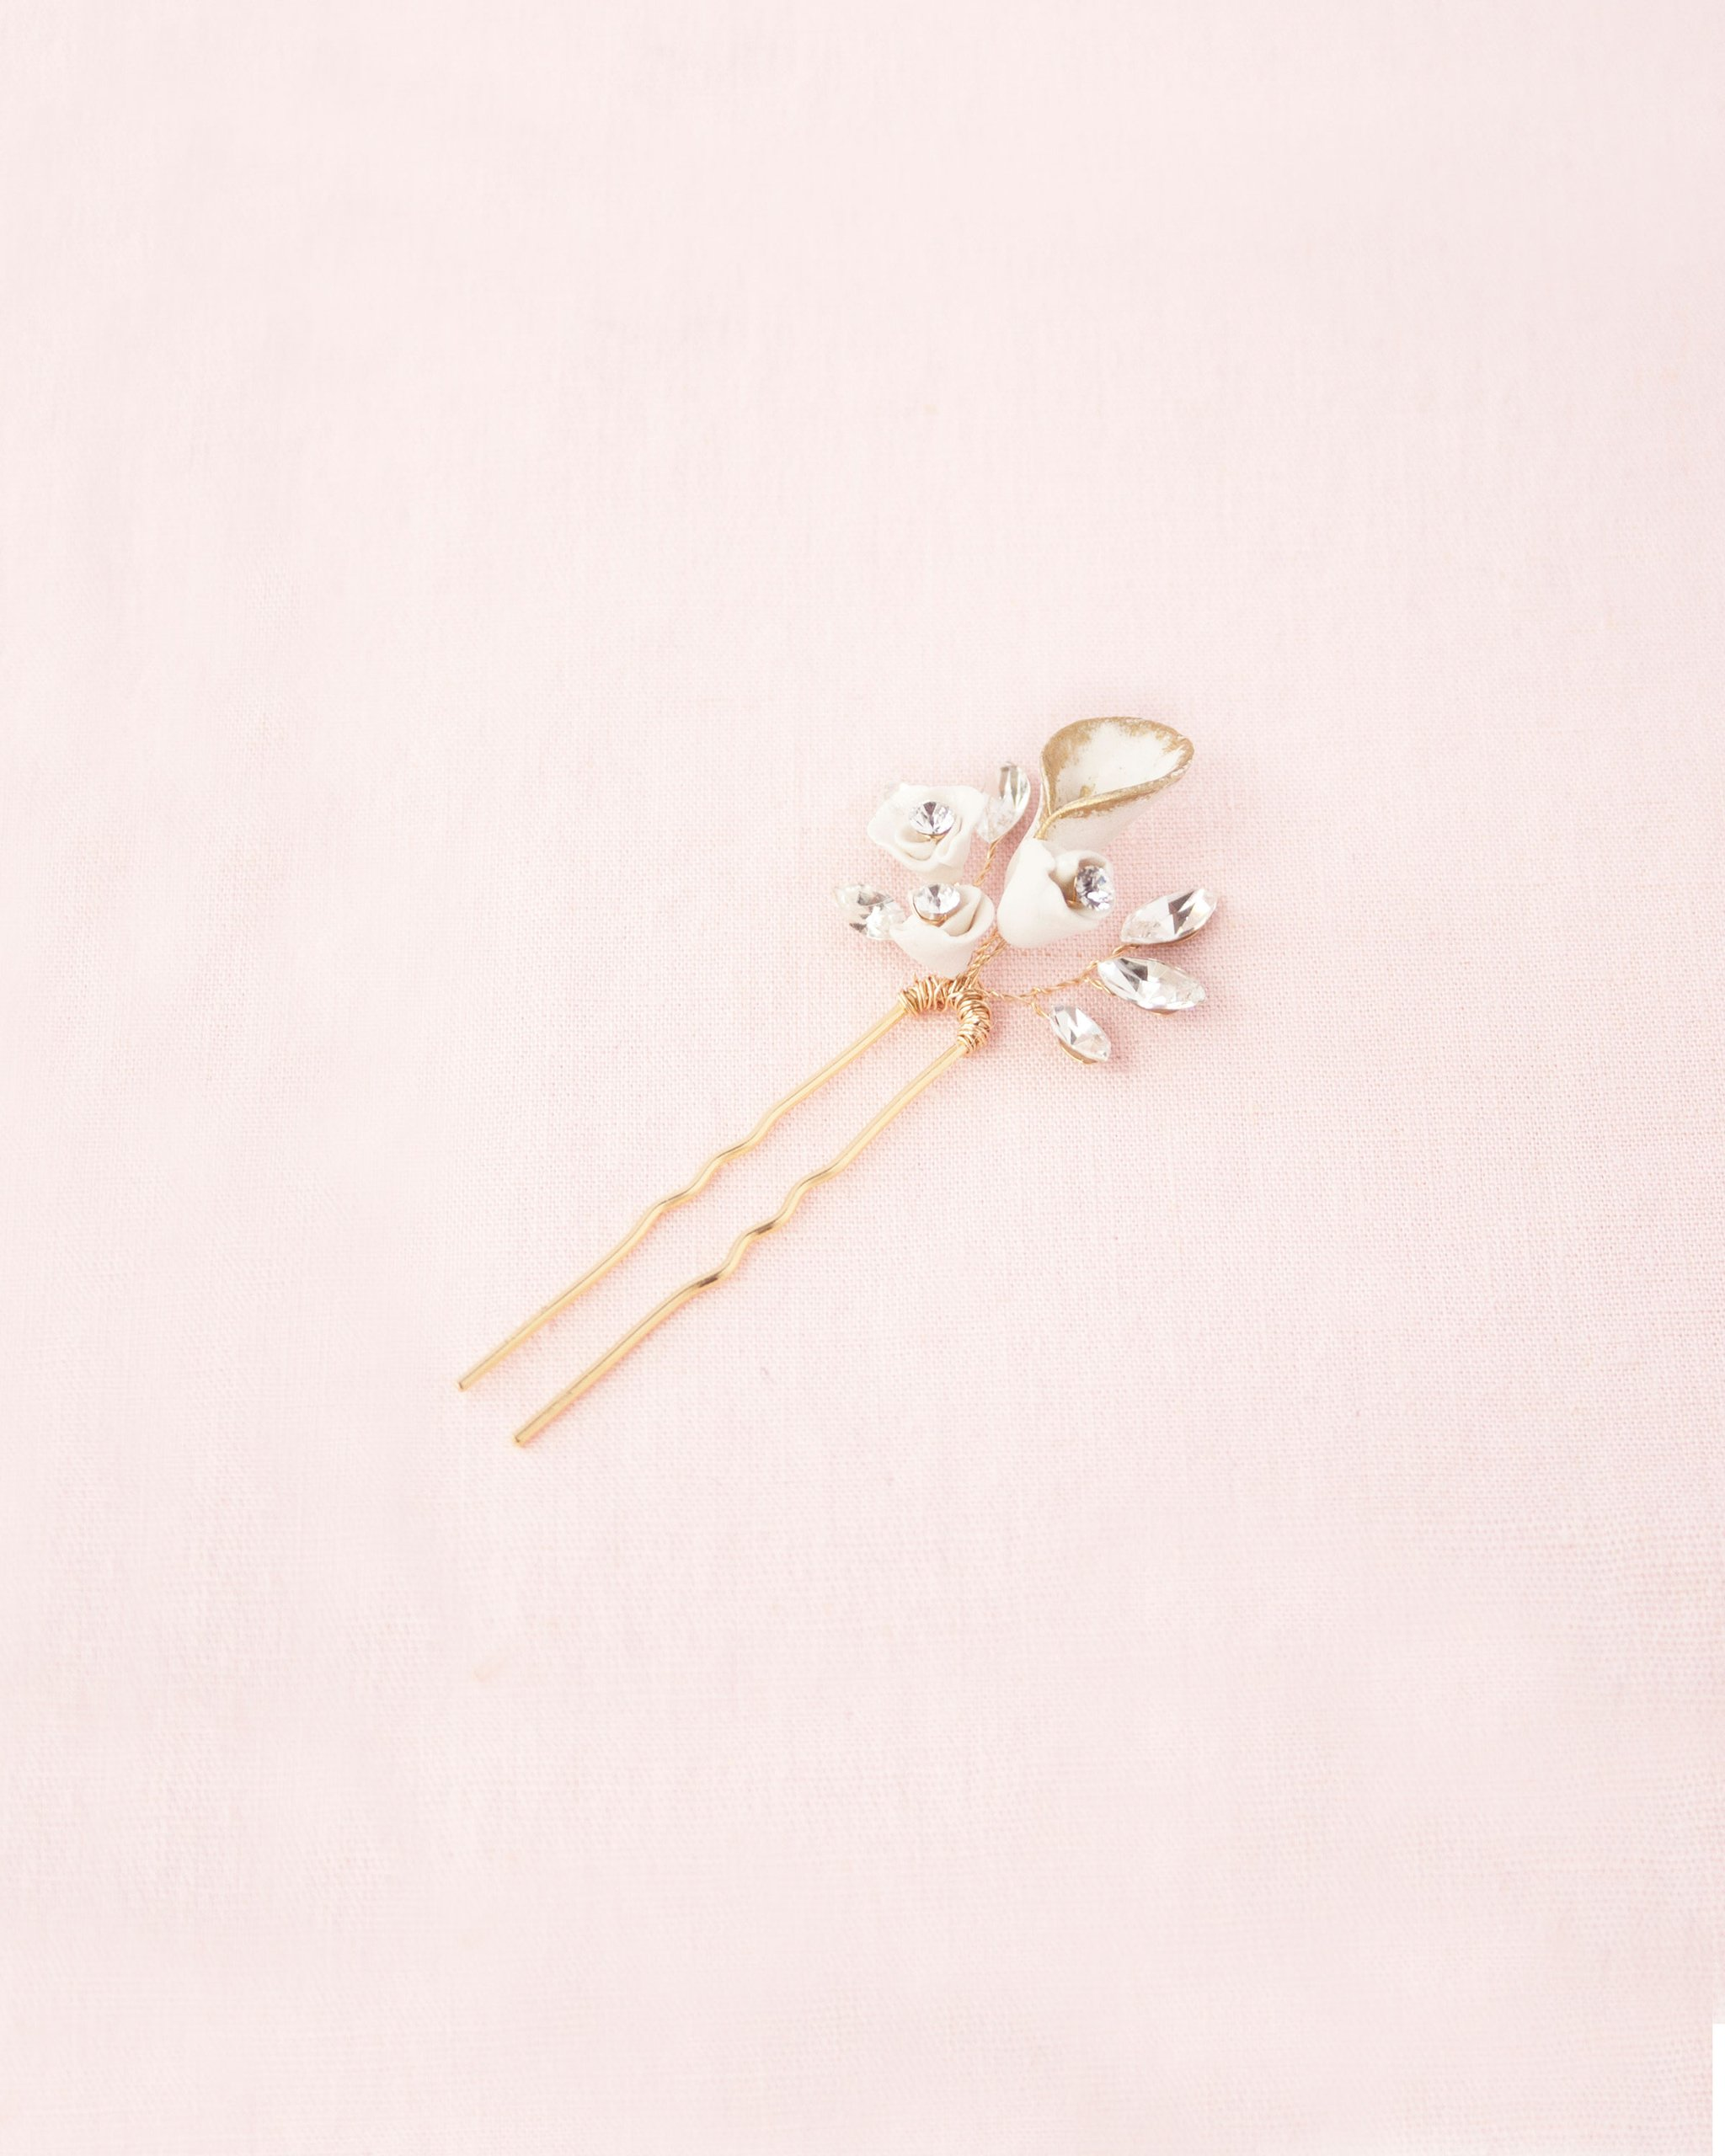 gilded-lily-hair-pin-cream-gold-1-atelier-elise-2400-web_2048x.jpg